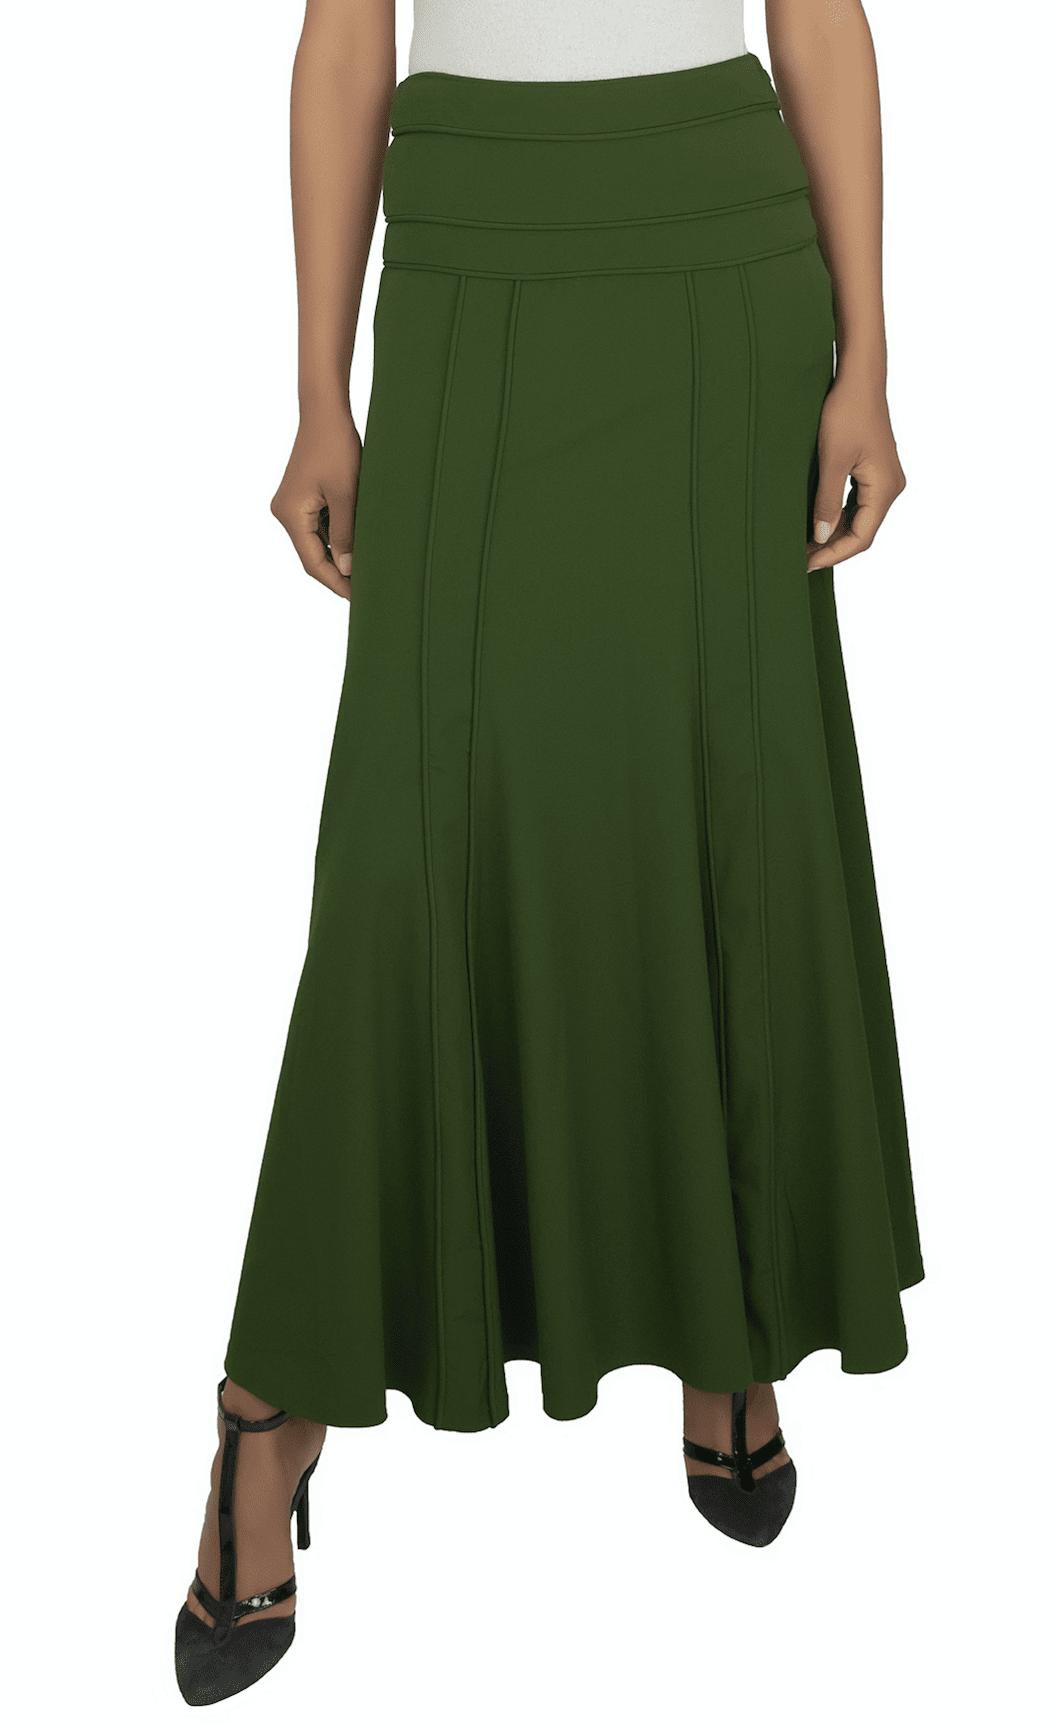 Skirt COLUMBA 0